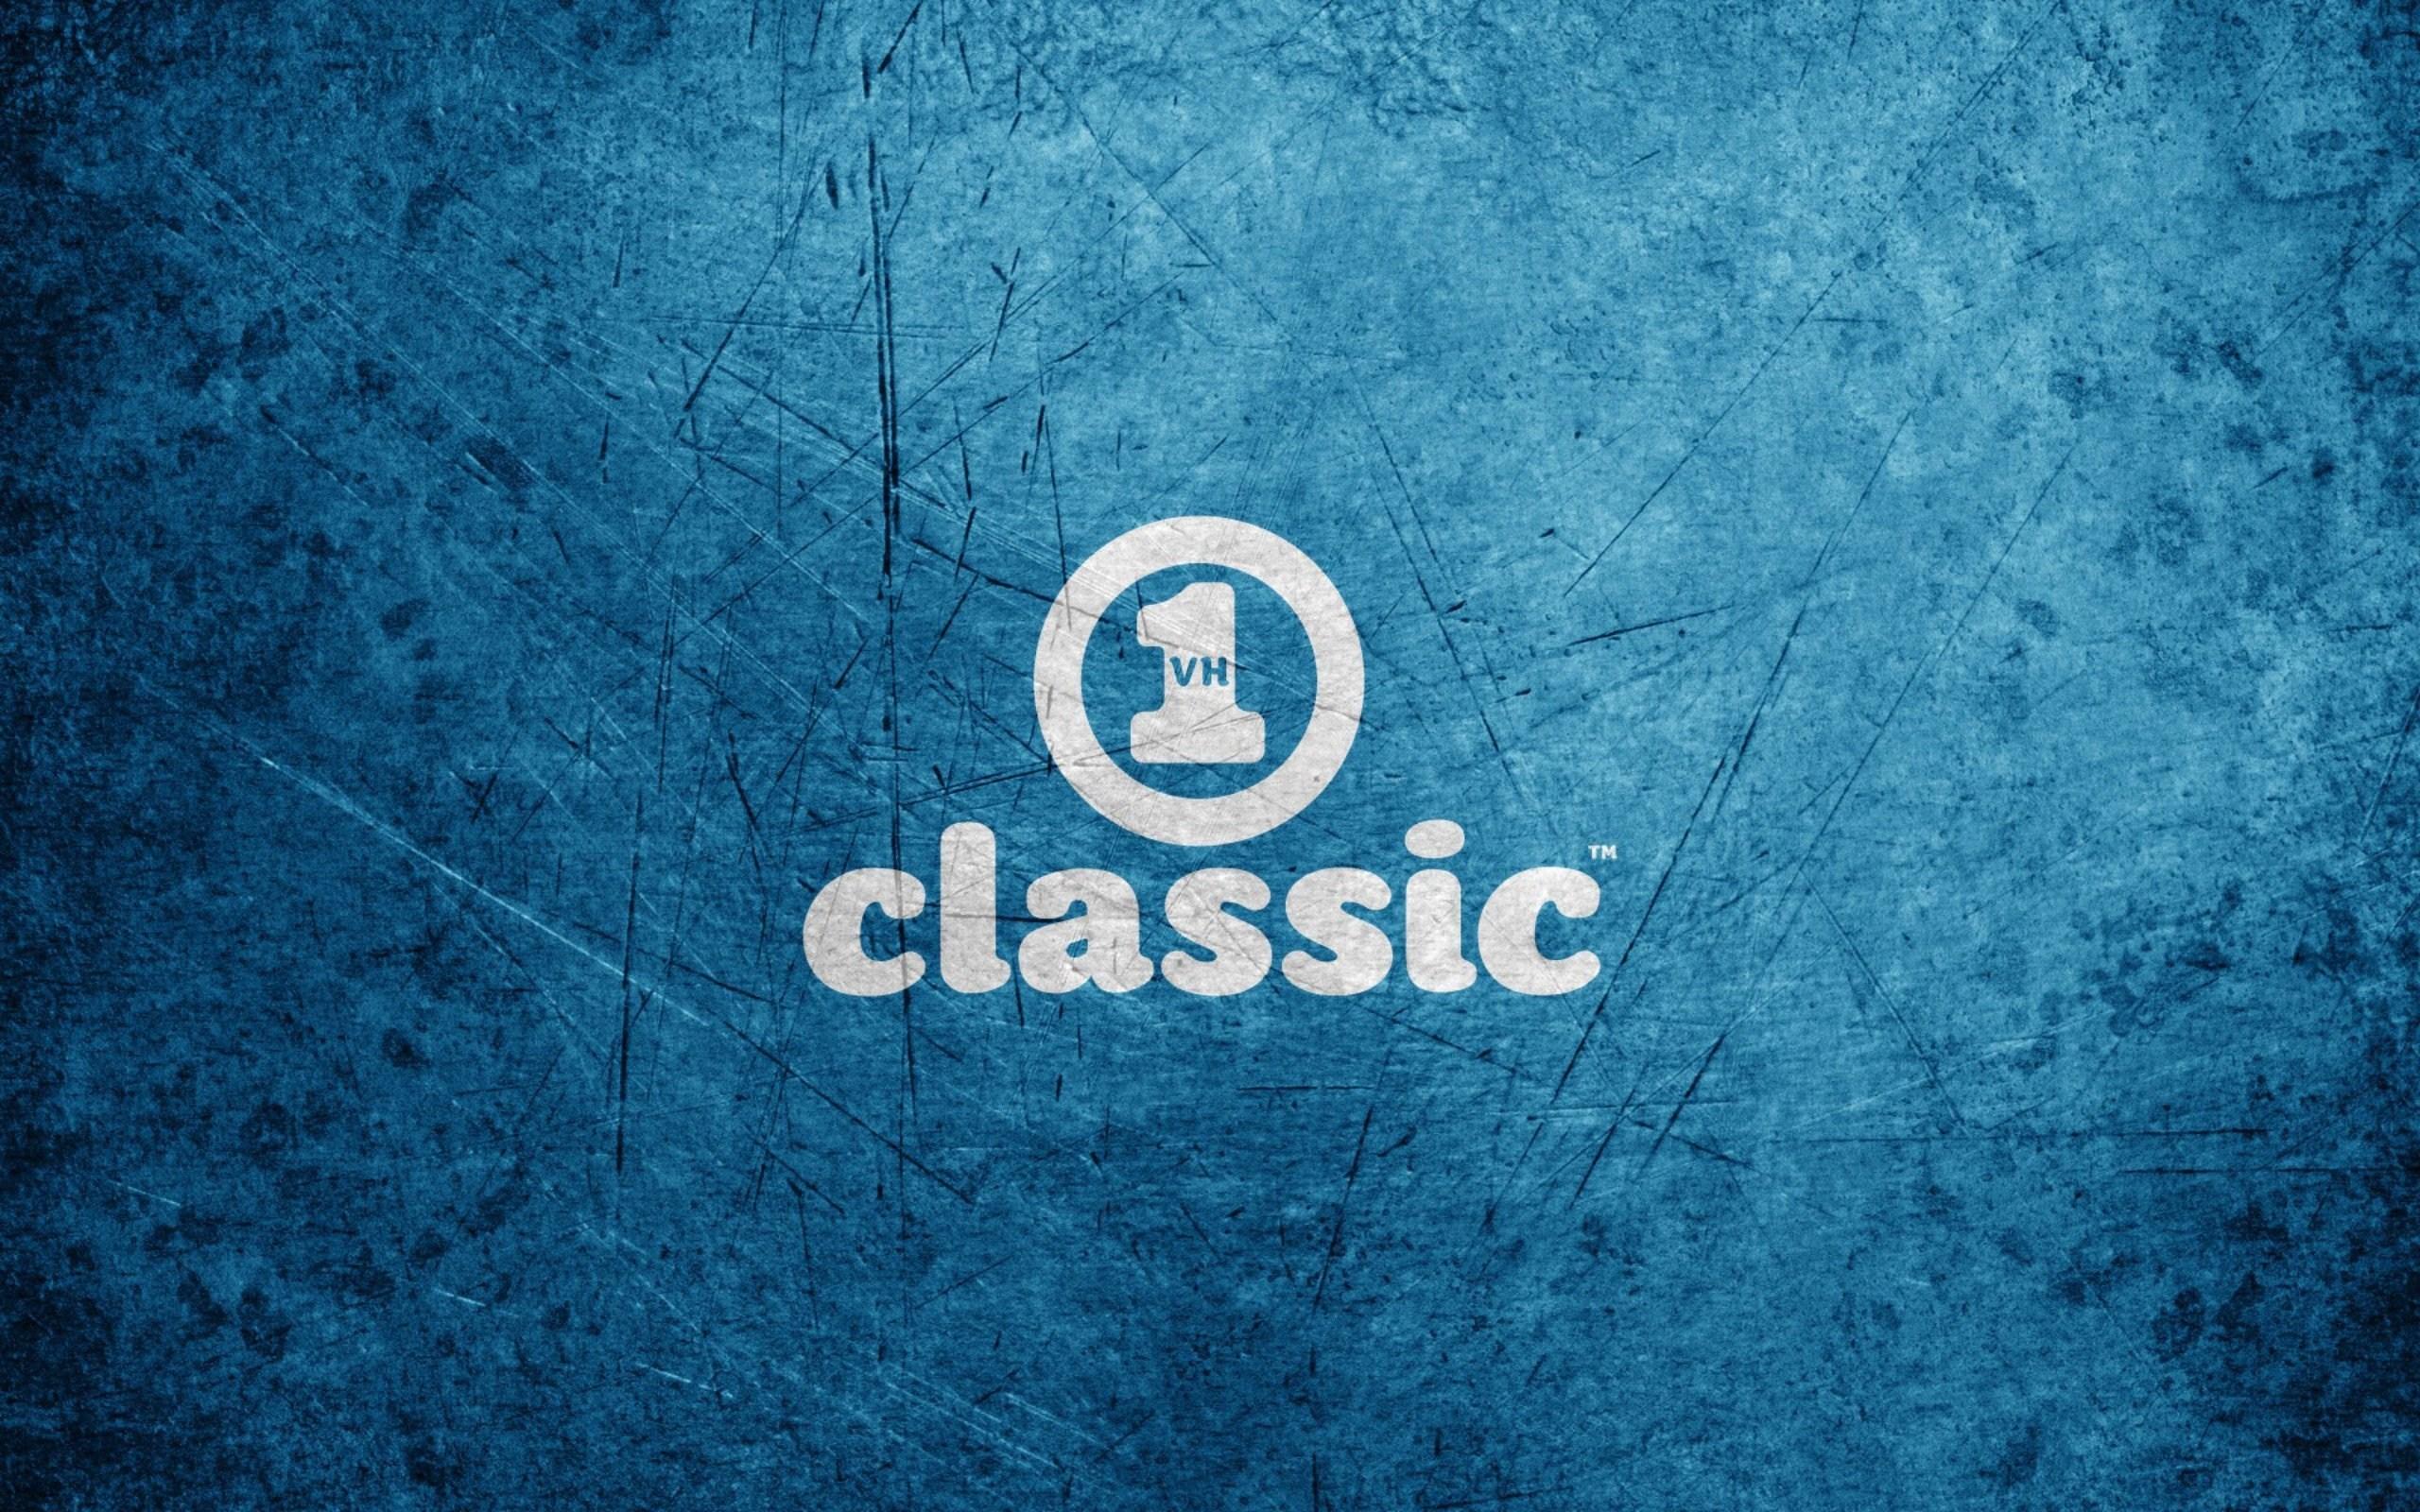 VH1 Classic Logo Music